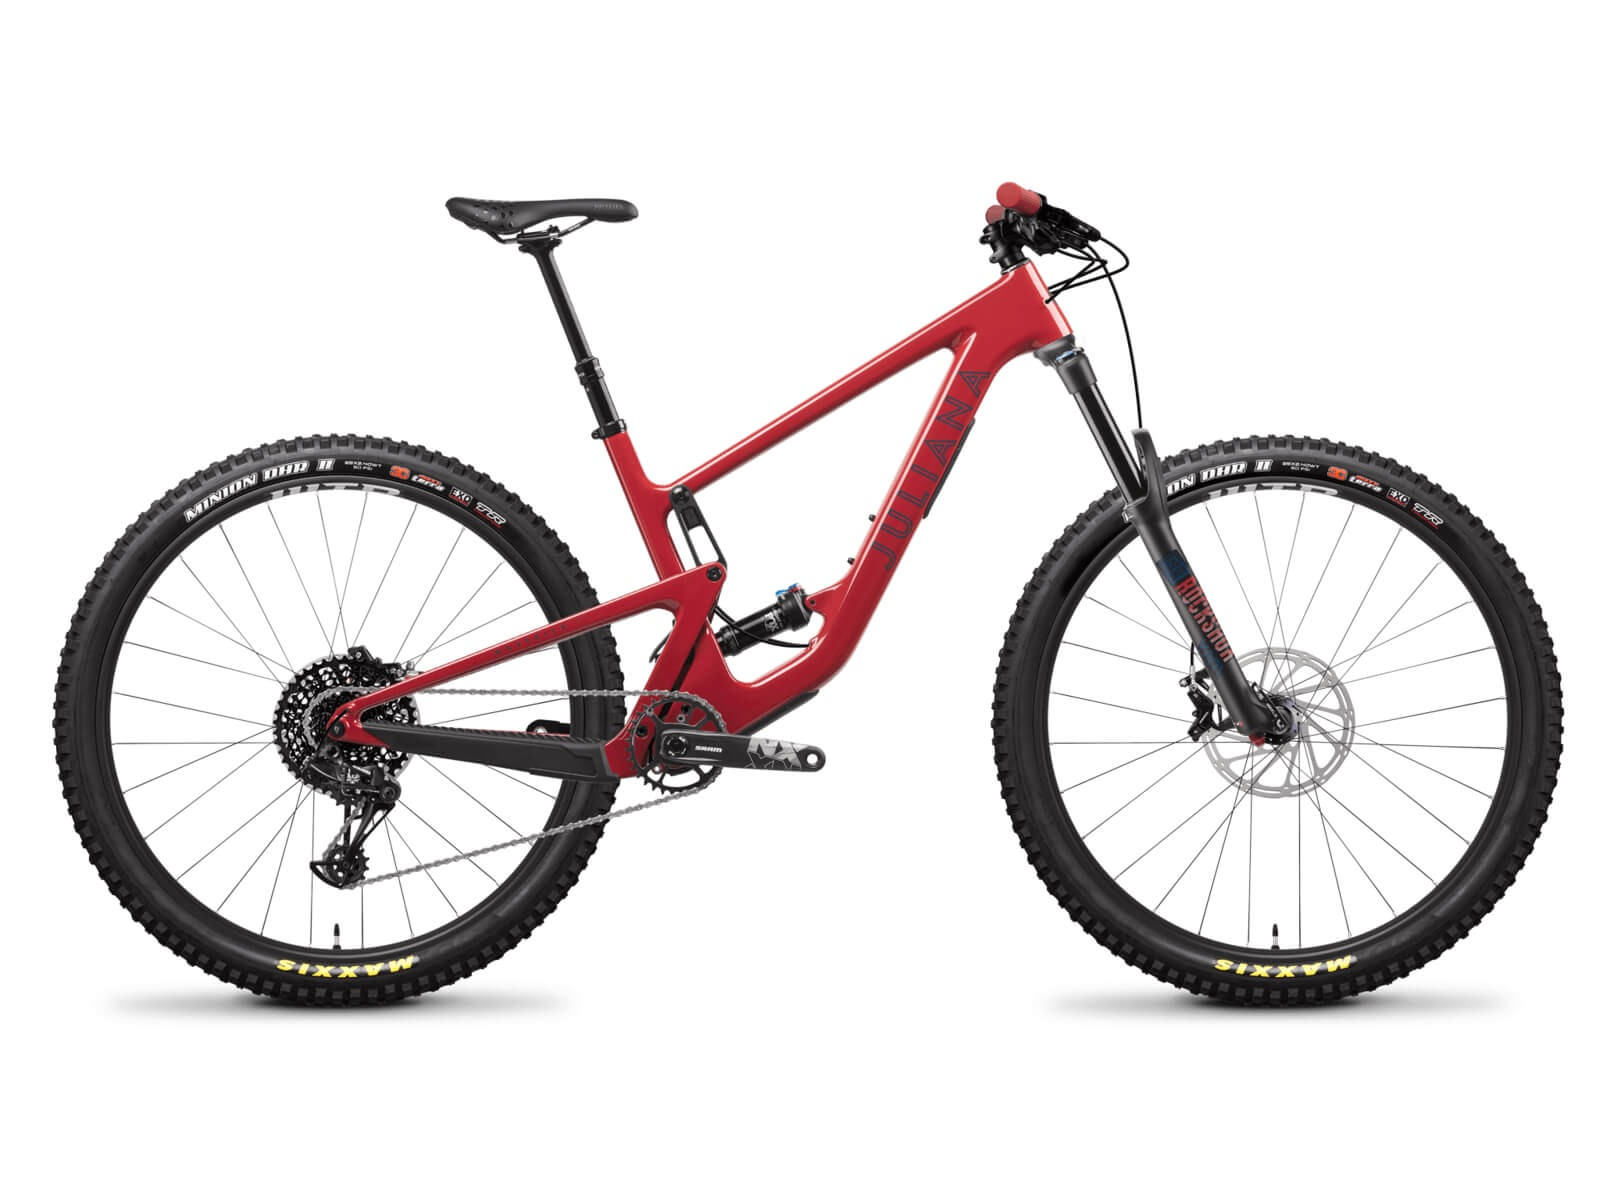 2020 Juliana Maverick C Mountain bike